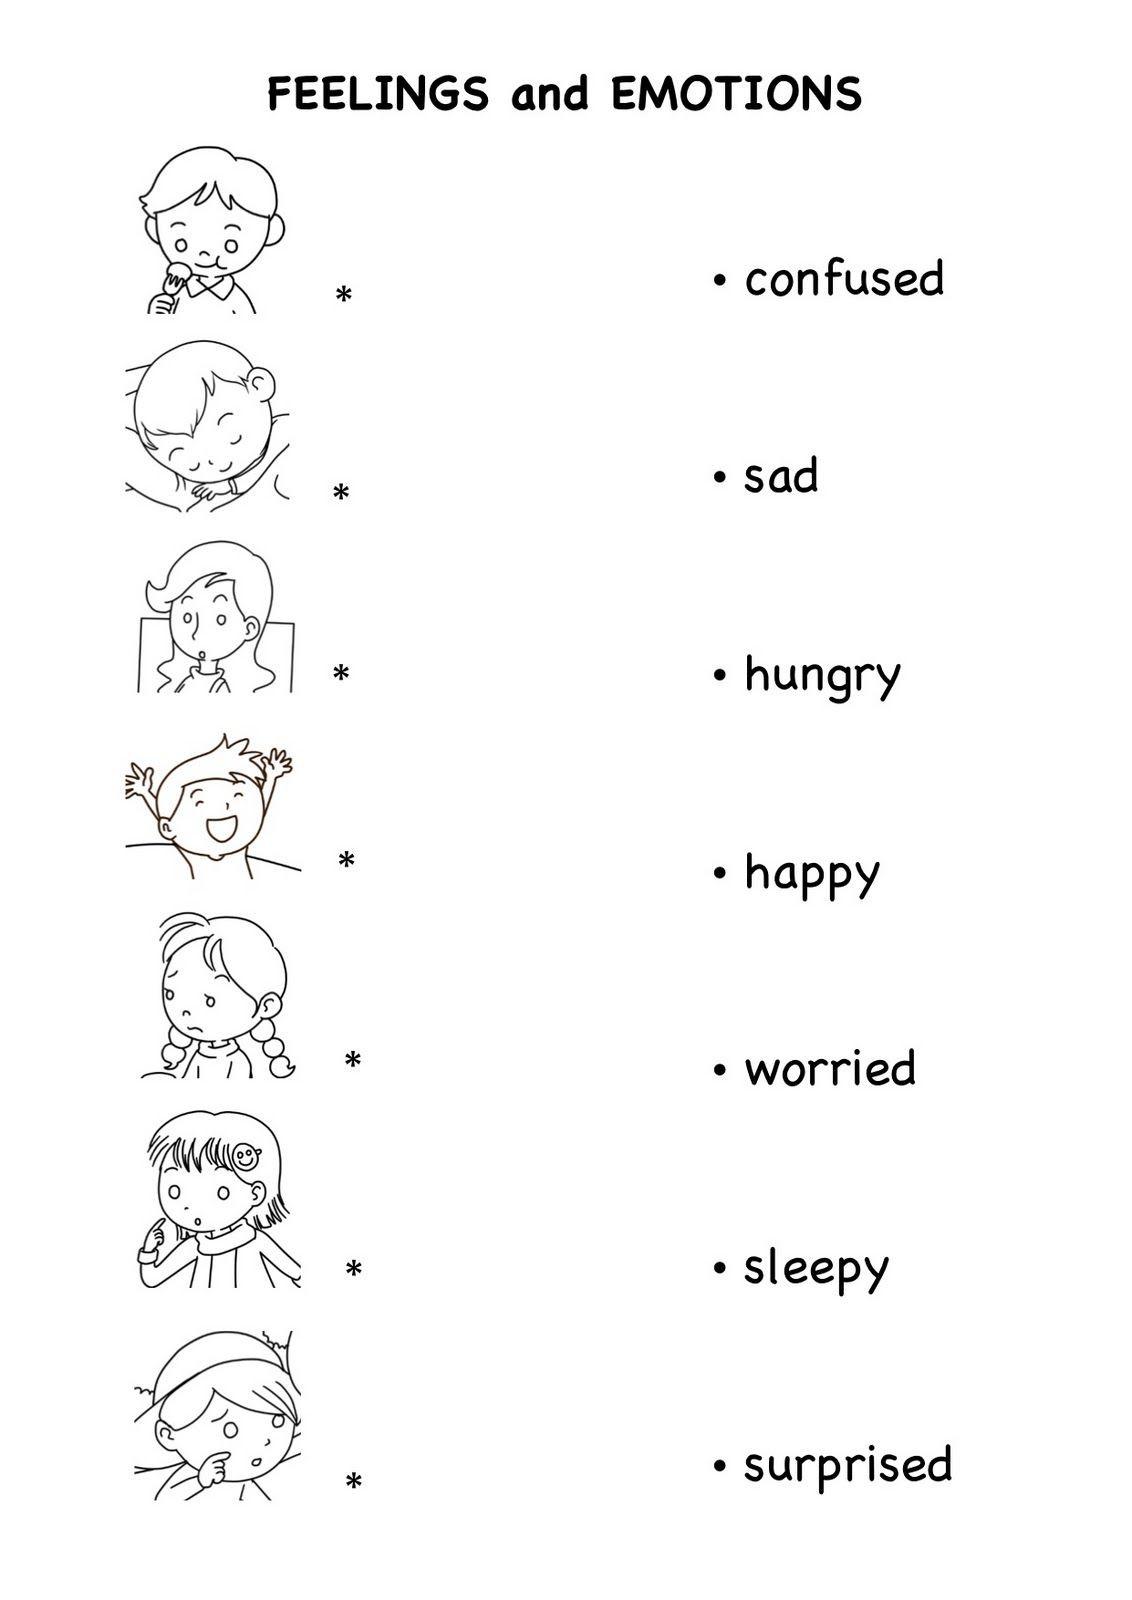 Feelings and Emotions Worksheets Printable ปักพินโดย Yuppadee Wongwai ใน ใบงานอนุ ในปี 2020